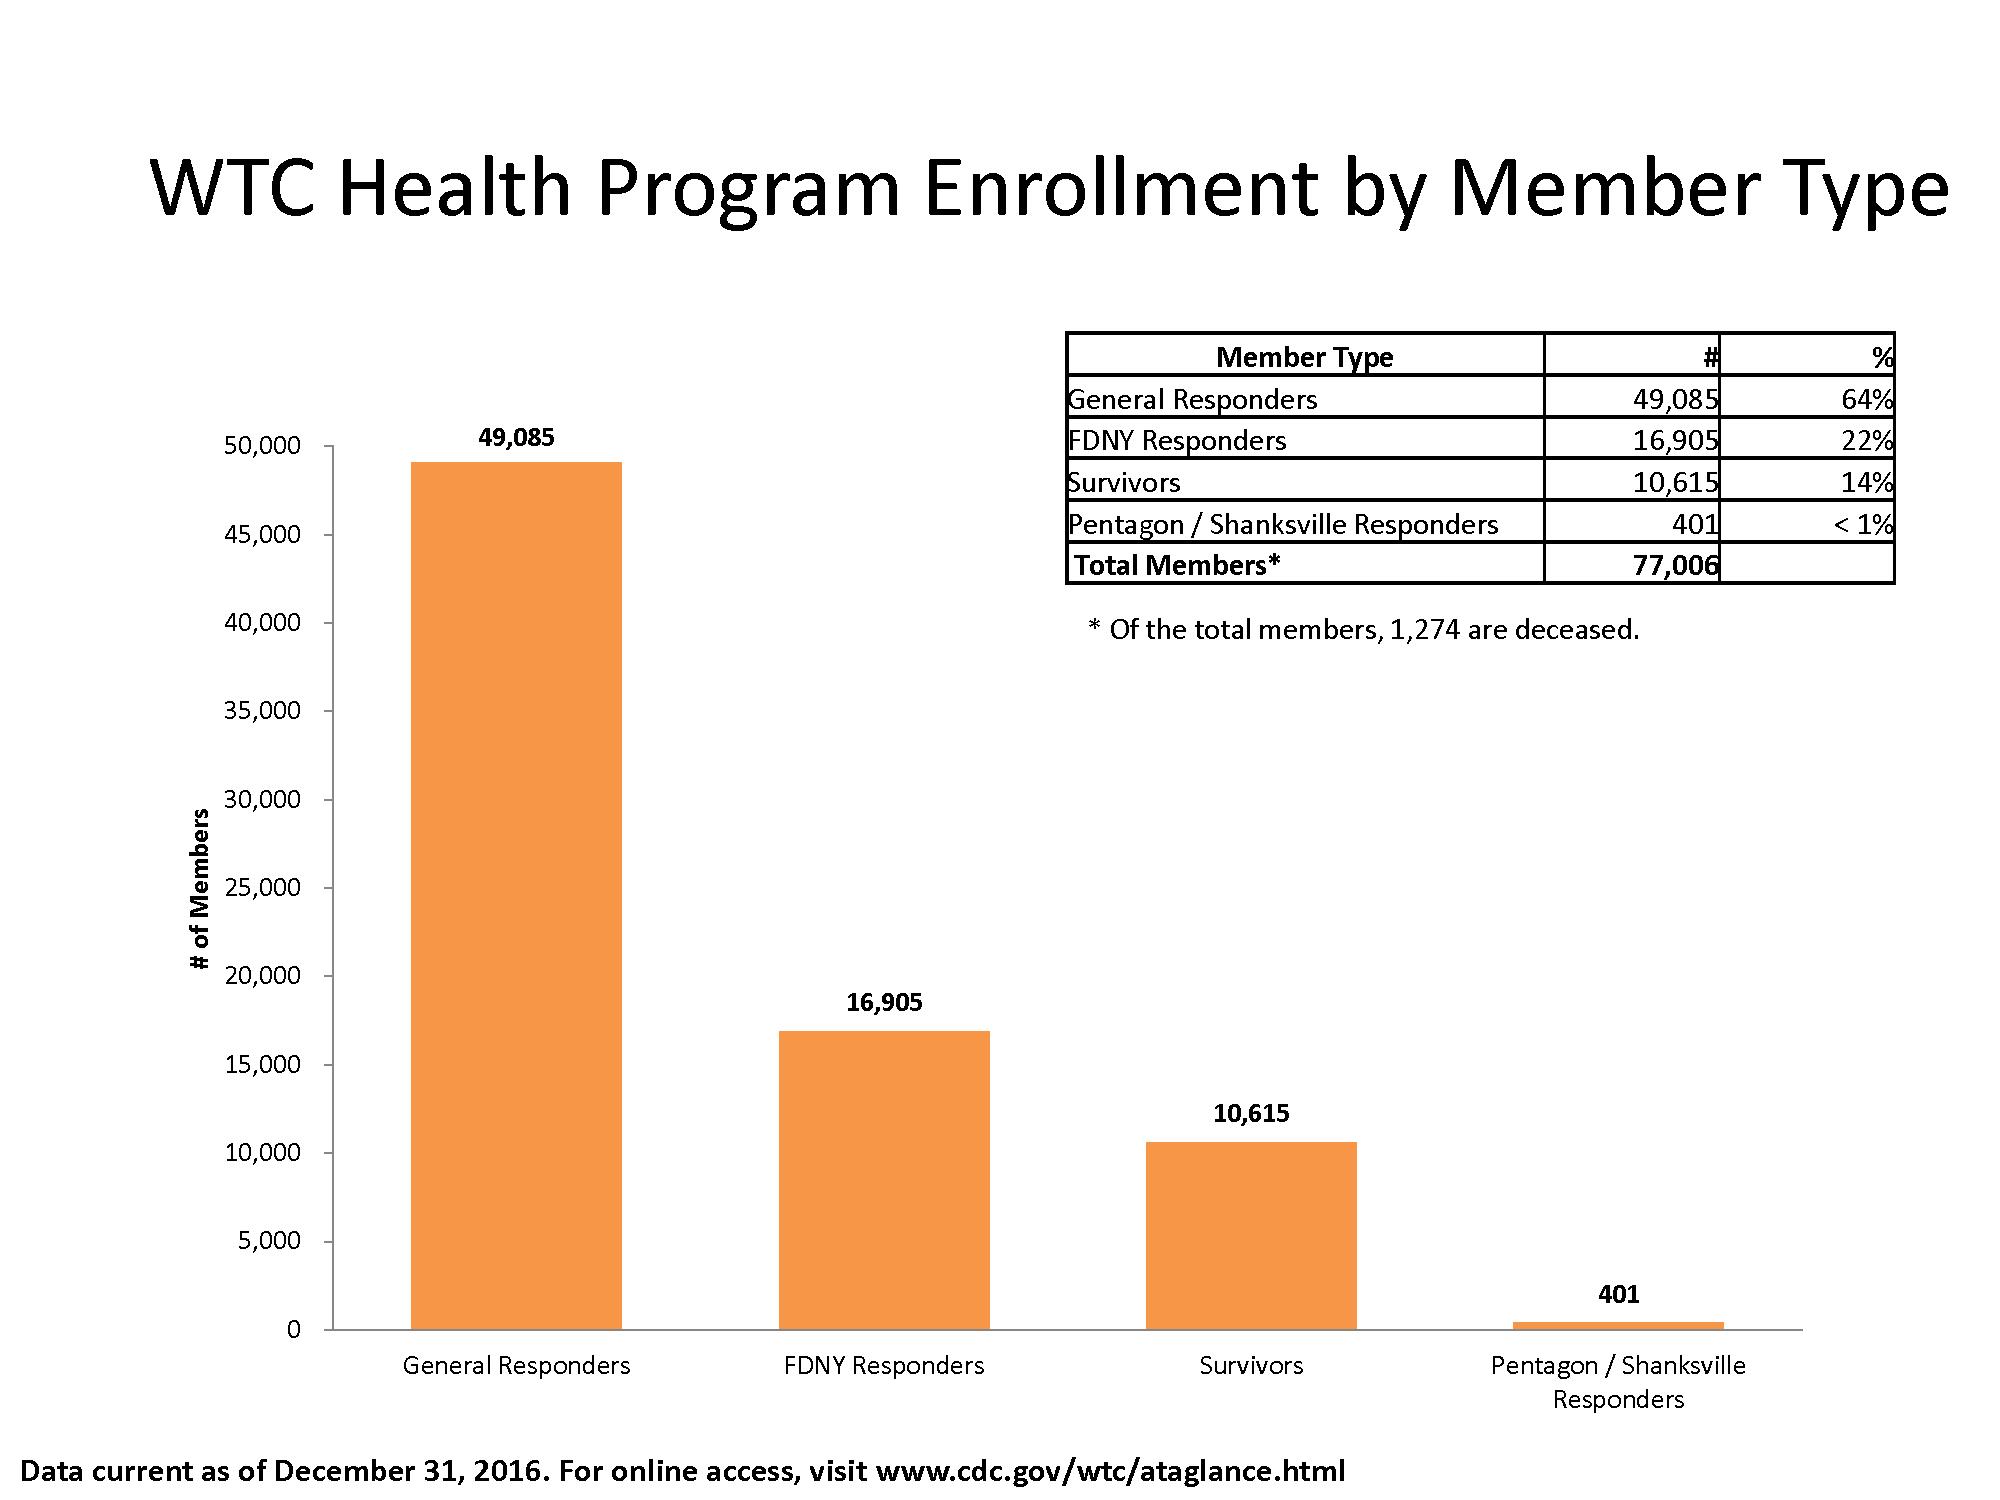 WTC Health Program Enrollment By Member Type